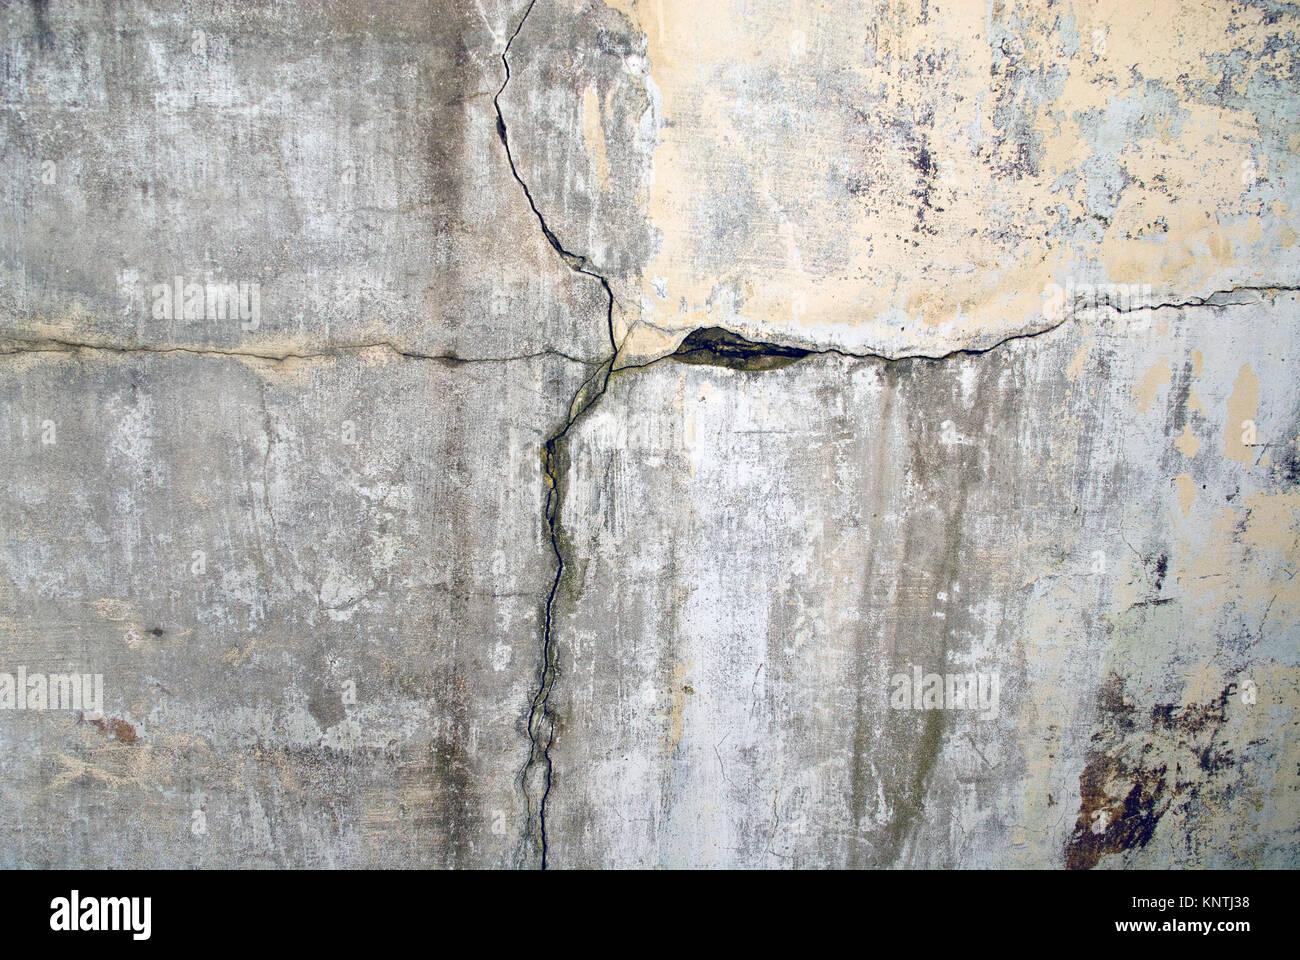 cracks in a wall stockfotos & cracks in a wall bilder - alamy